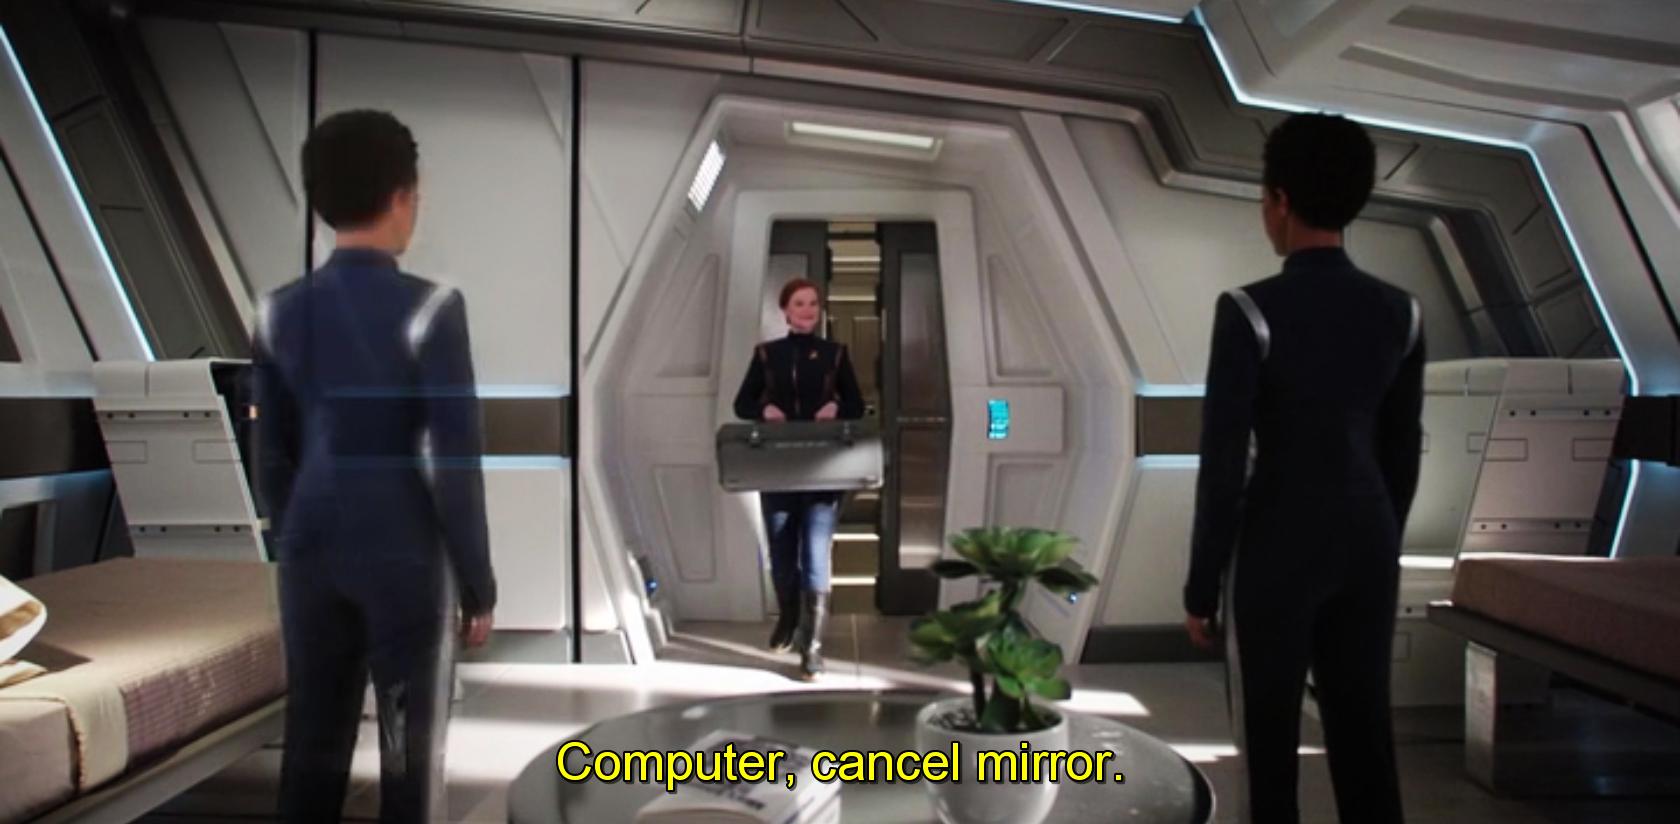 Michael Burnham's virtual mirror that closes itself on vocal command (episode 4).